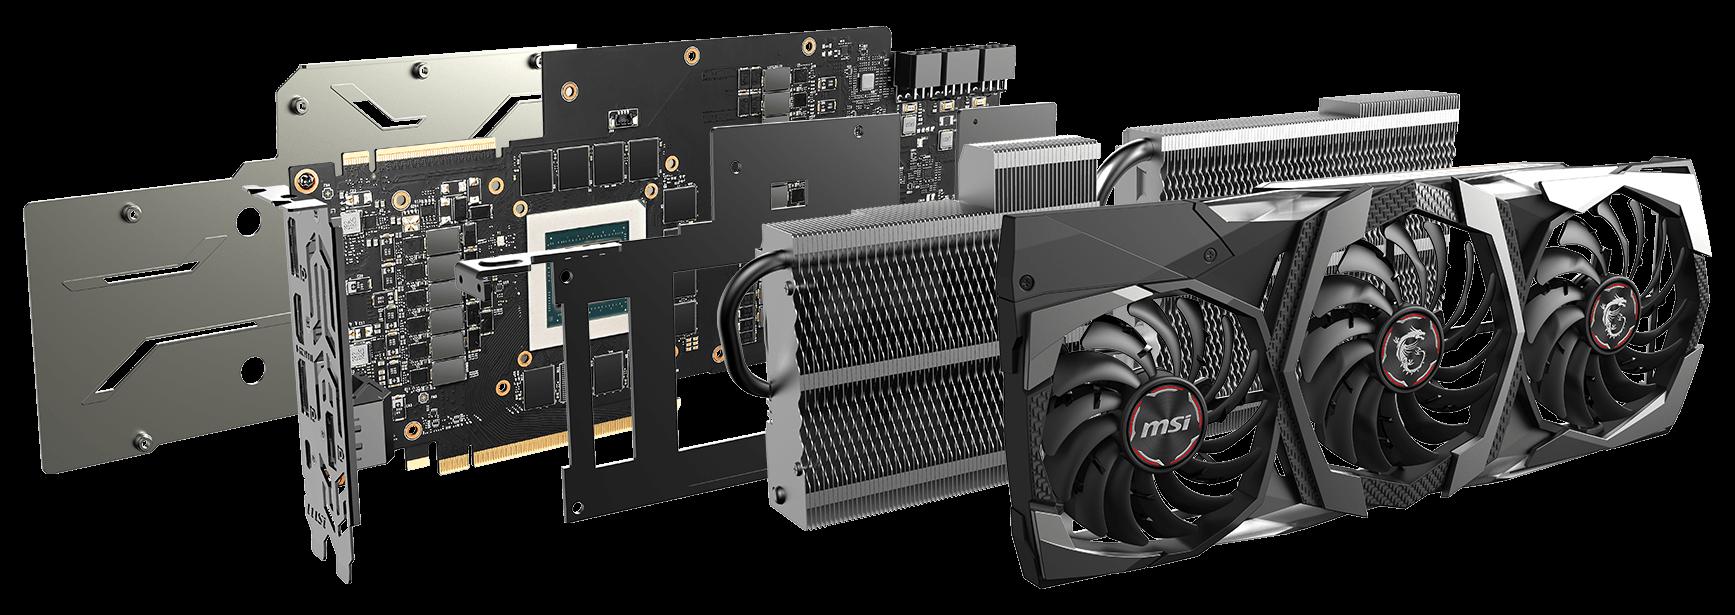 GeForce RTX 2080 Ti GAMING X TRIO | Graphics card - The